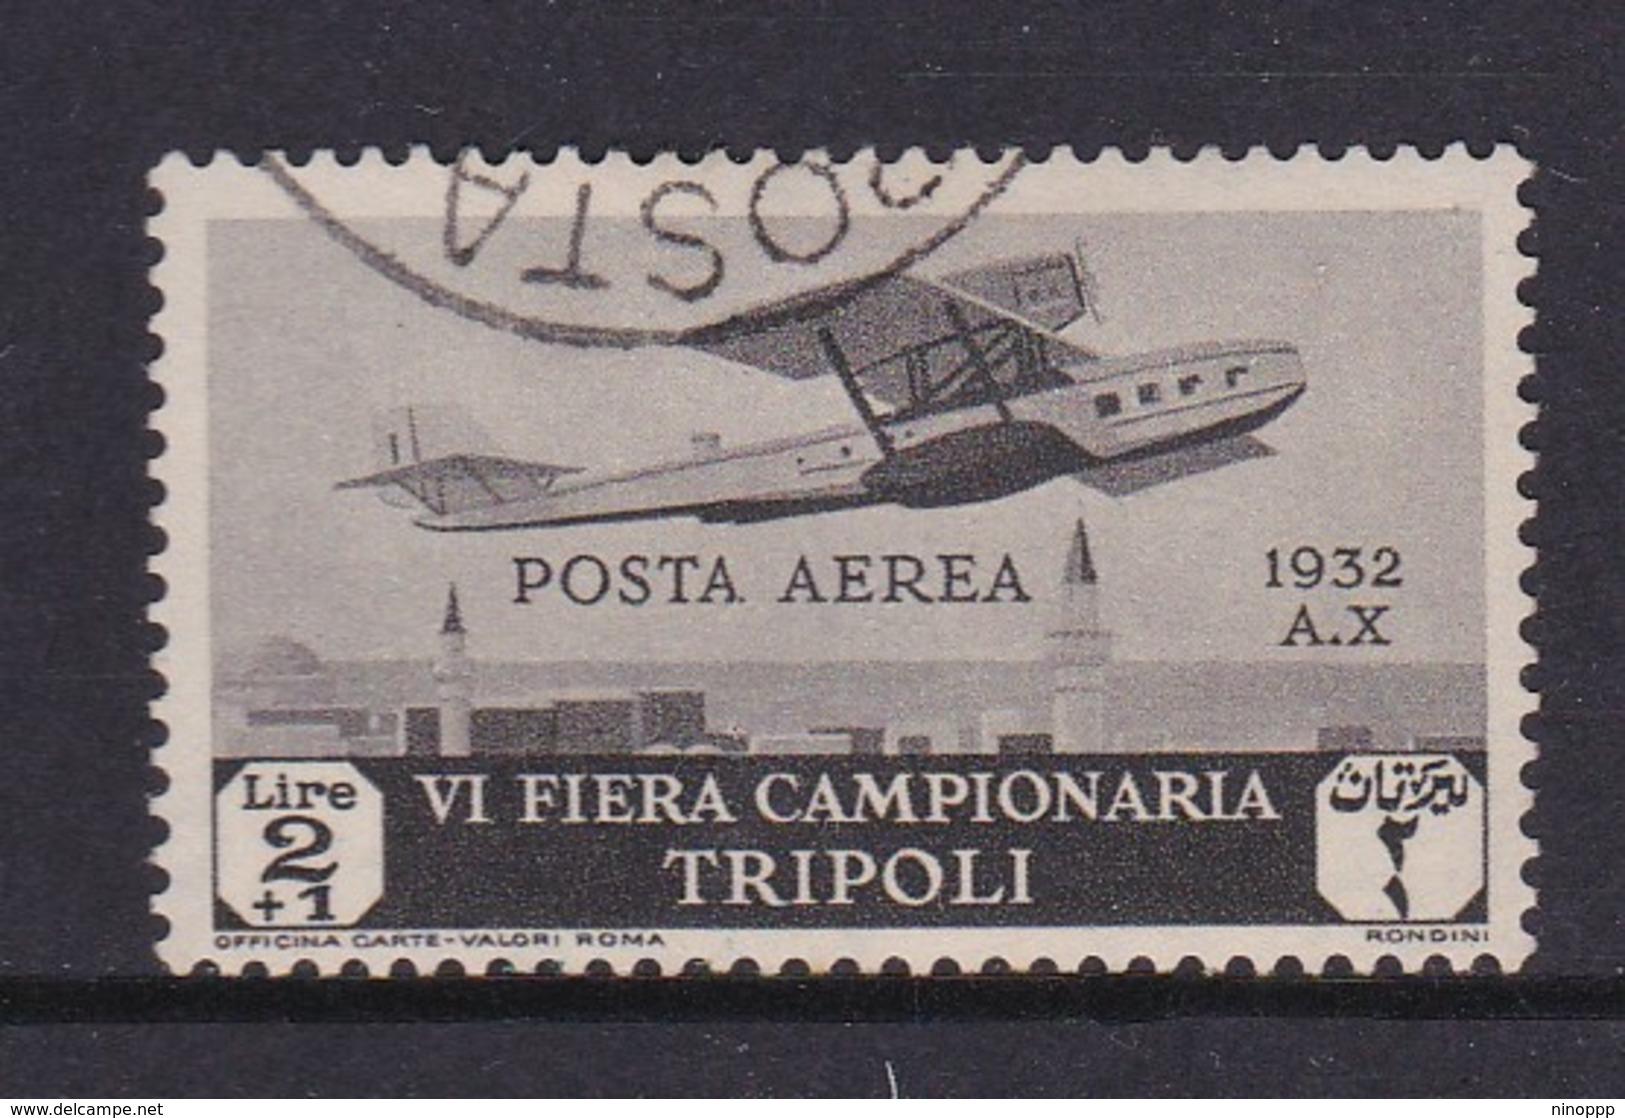 Italy-Colonies And Territories-Libya S AP6 1932 Sixth Sample Fair Tripoli,2 Lire Gray,used - Libya